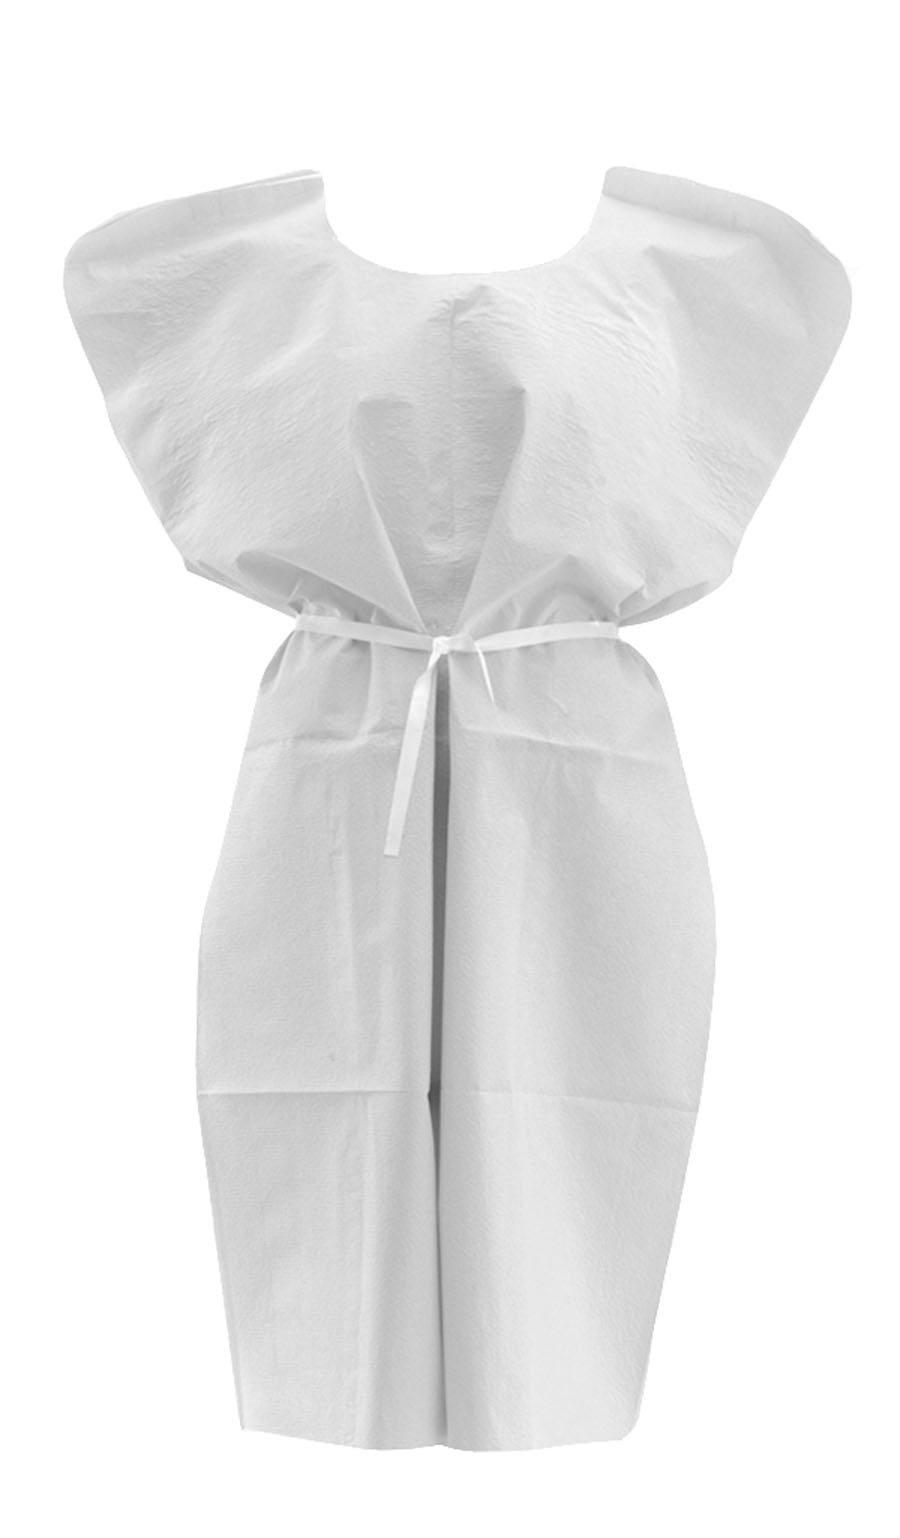 Medline NON24355 Disposable Patient Gowns, Large, White (Case of 50)